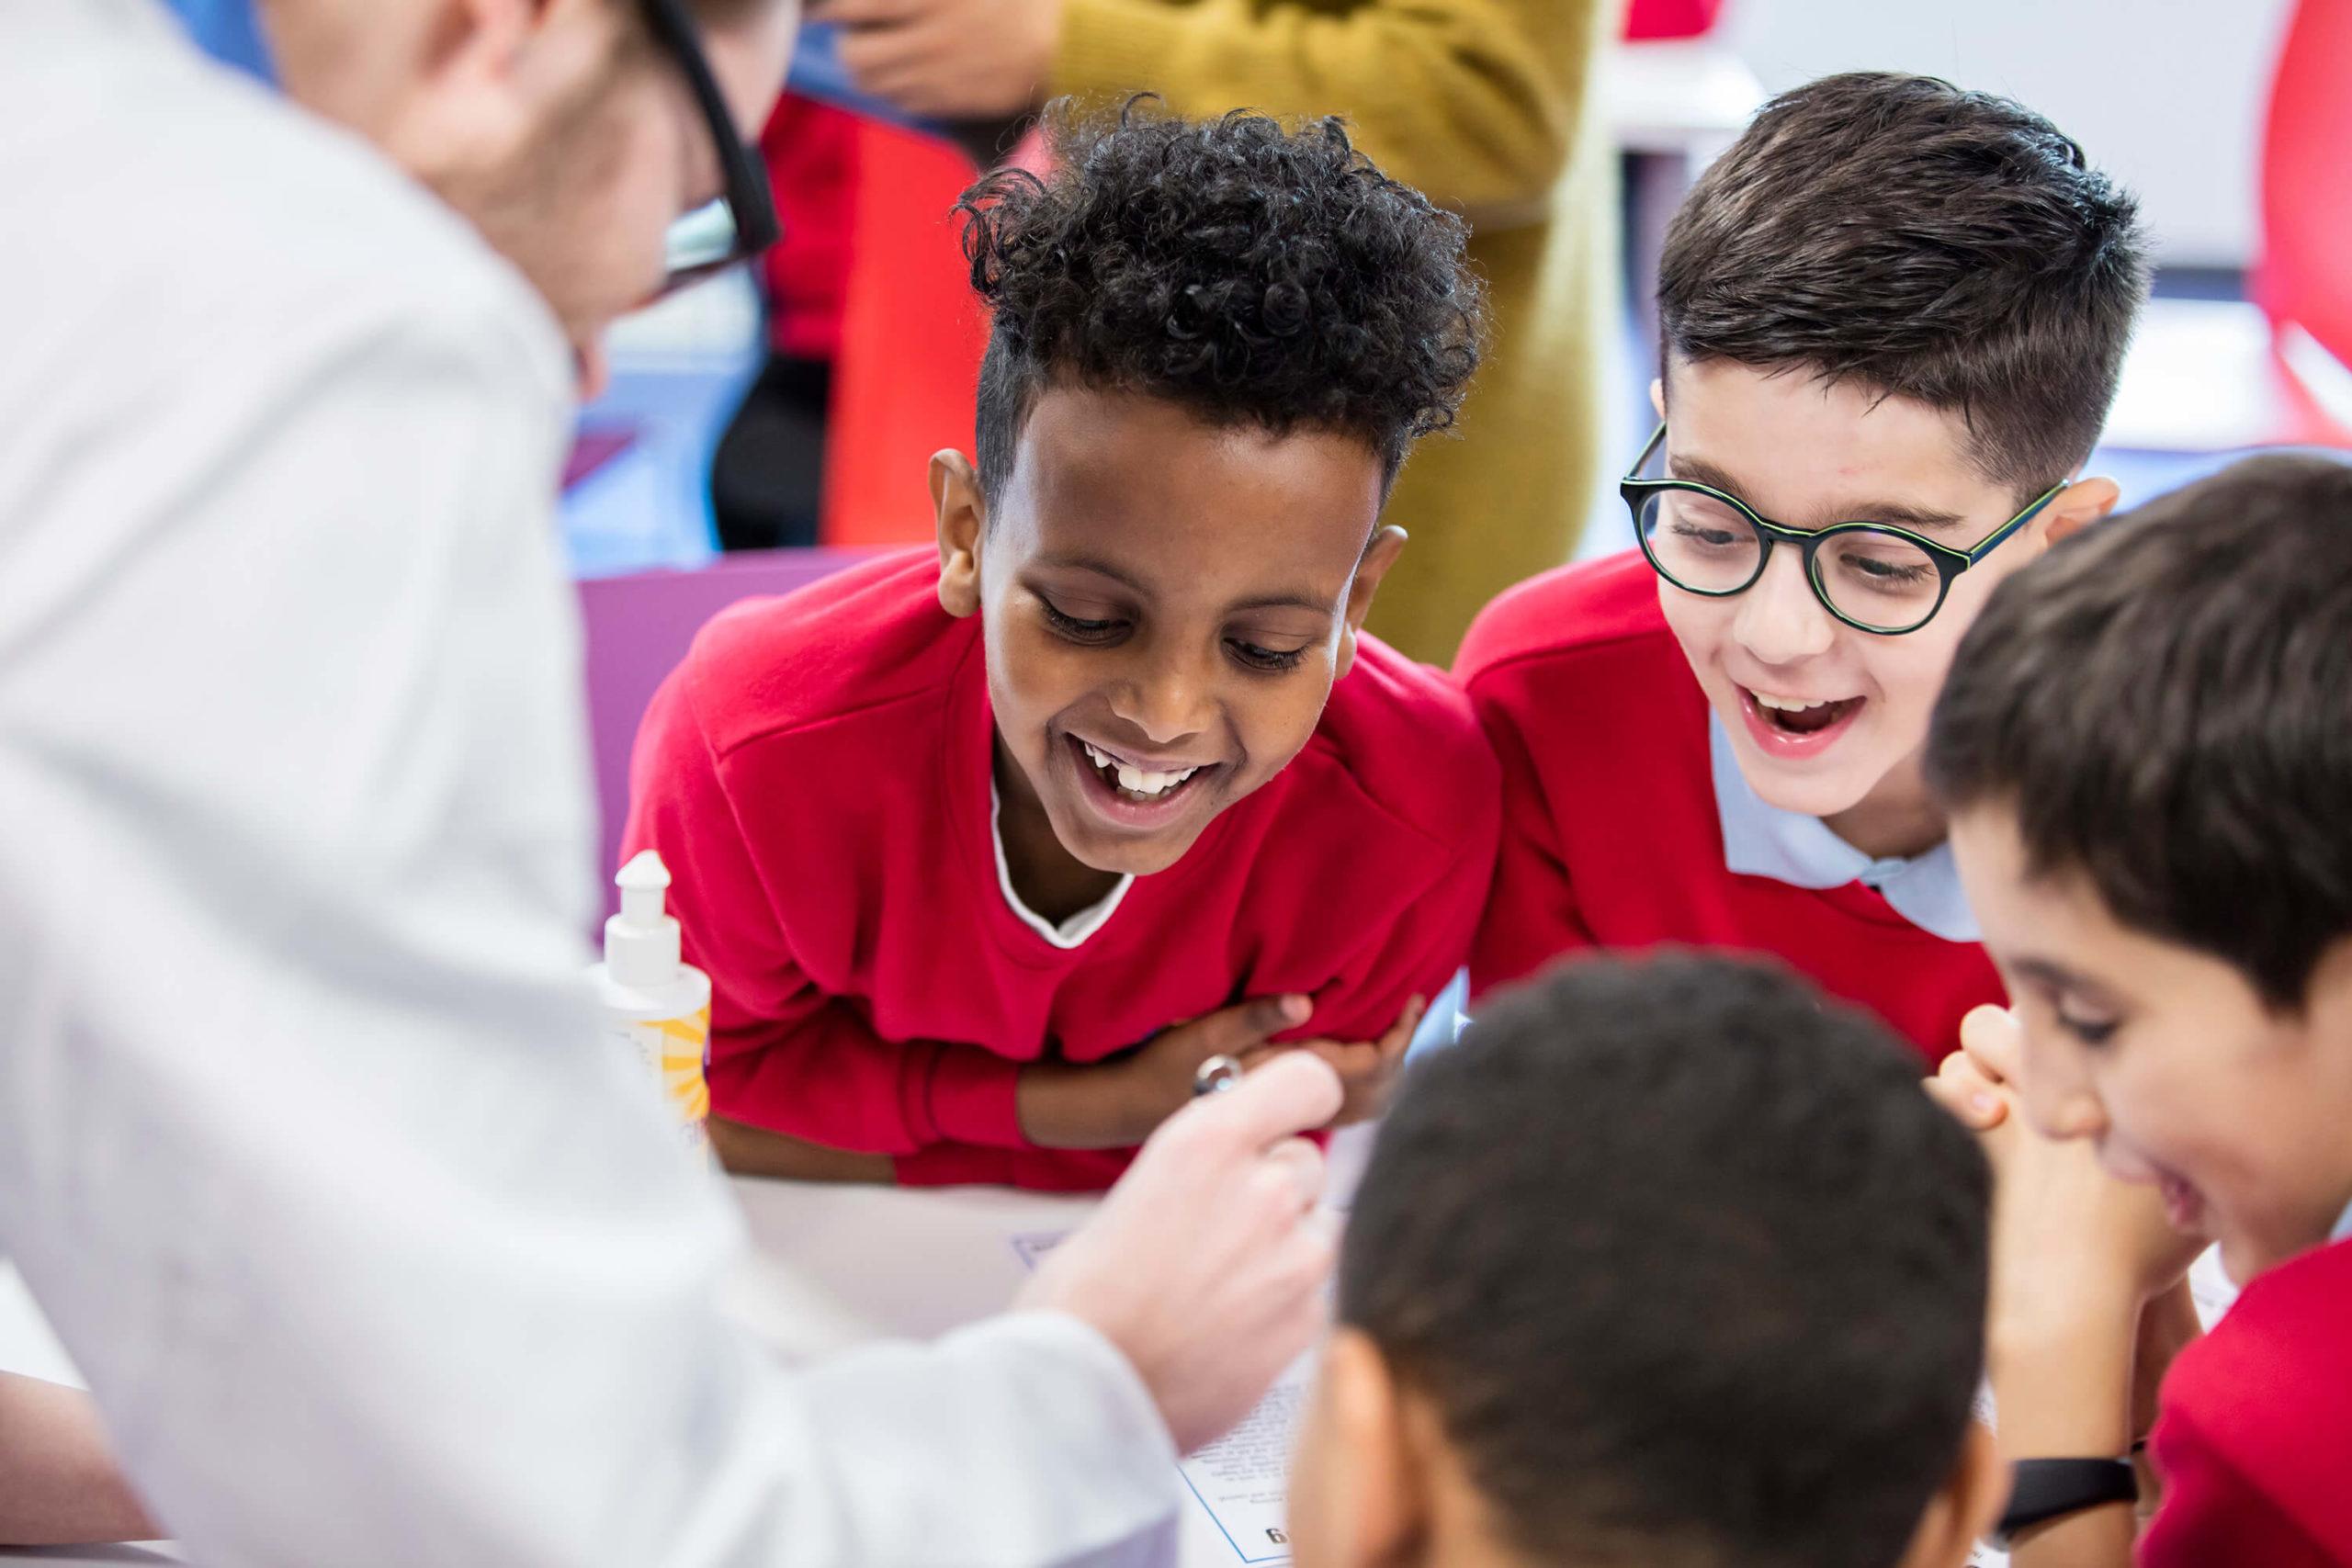 Institute of Biomedical Science children's workshops